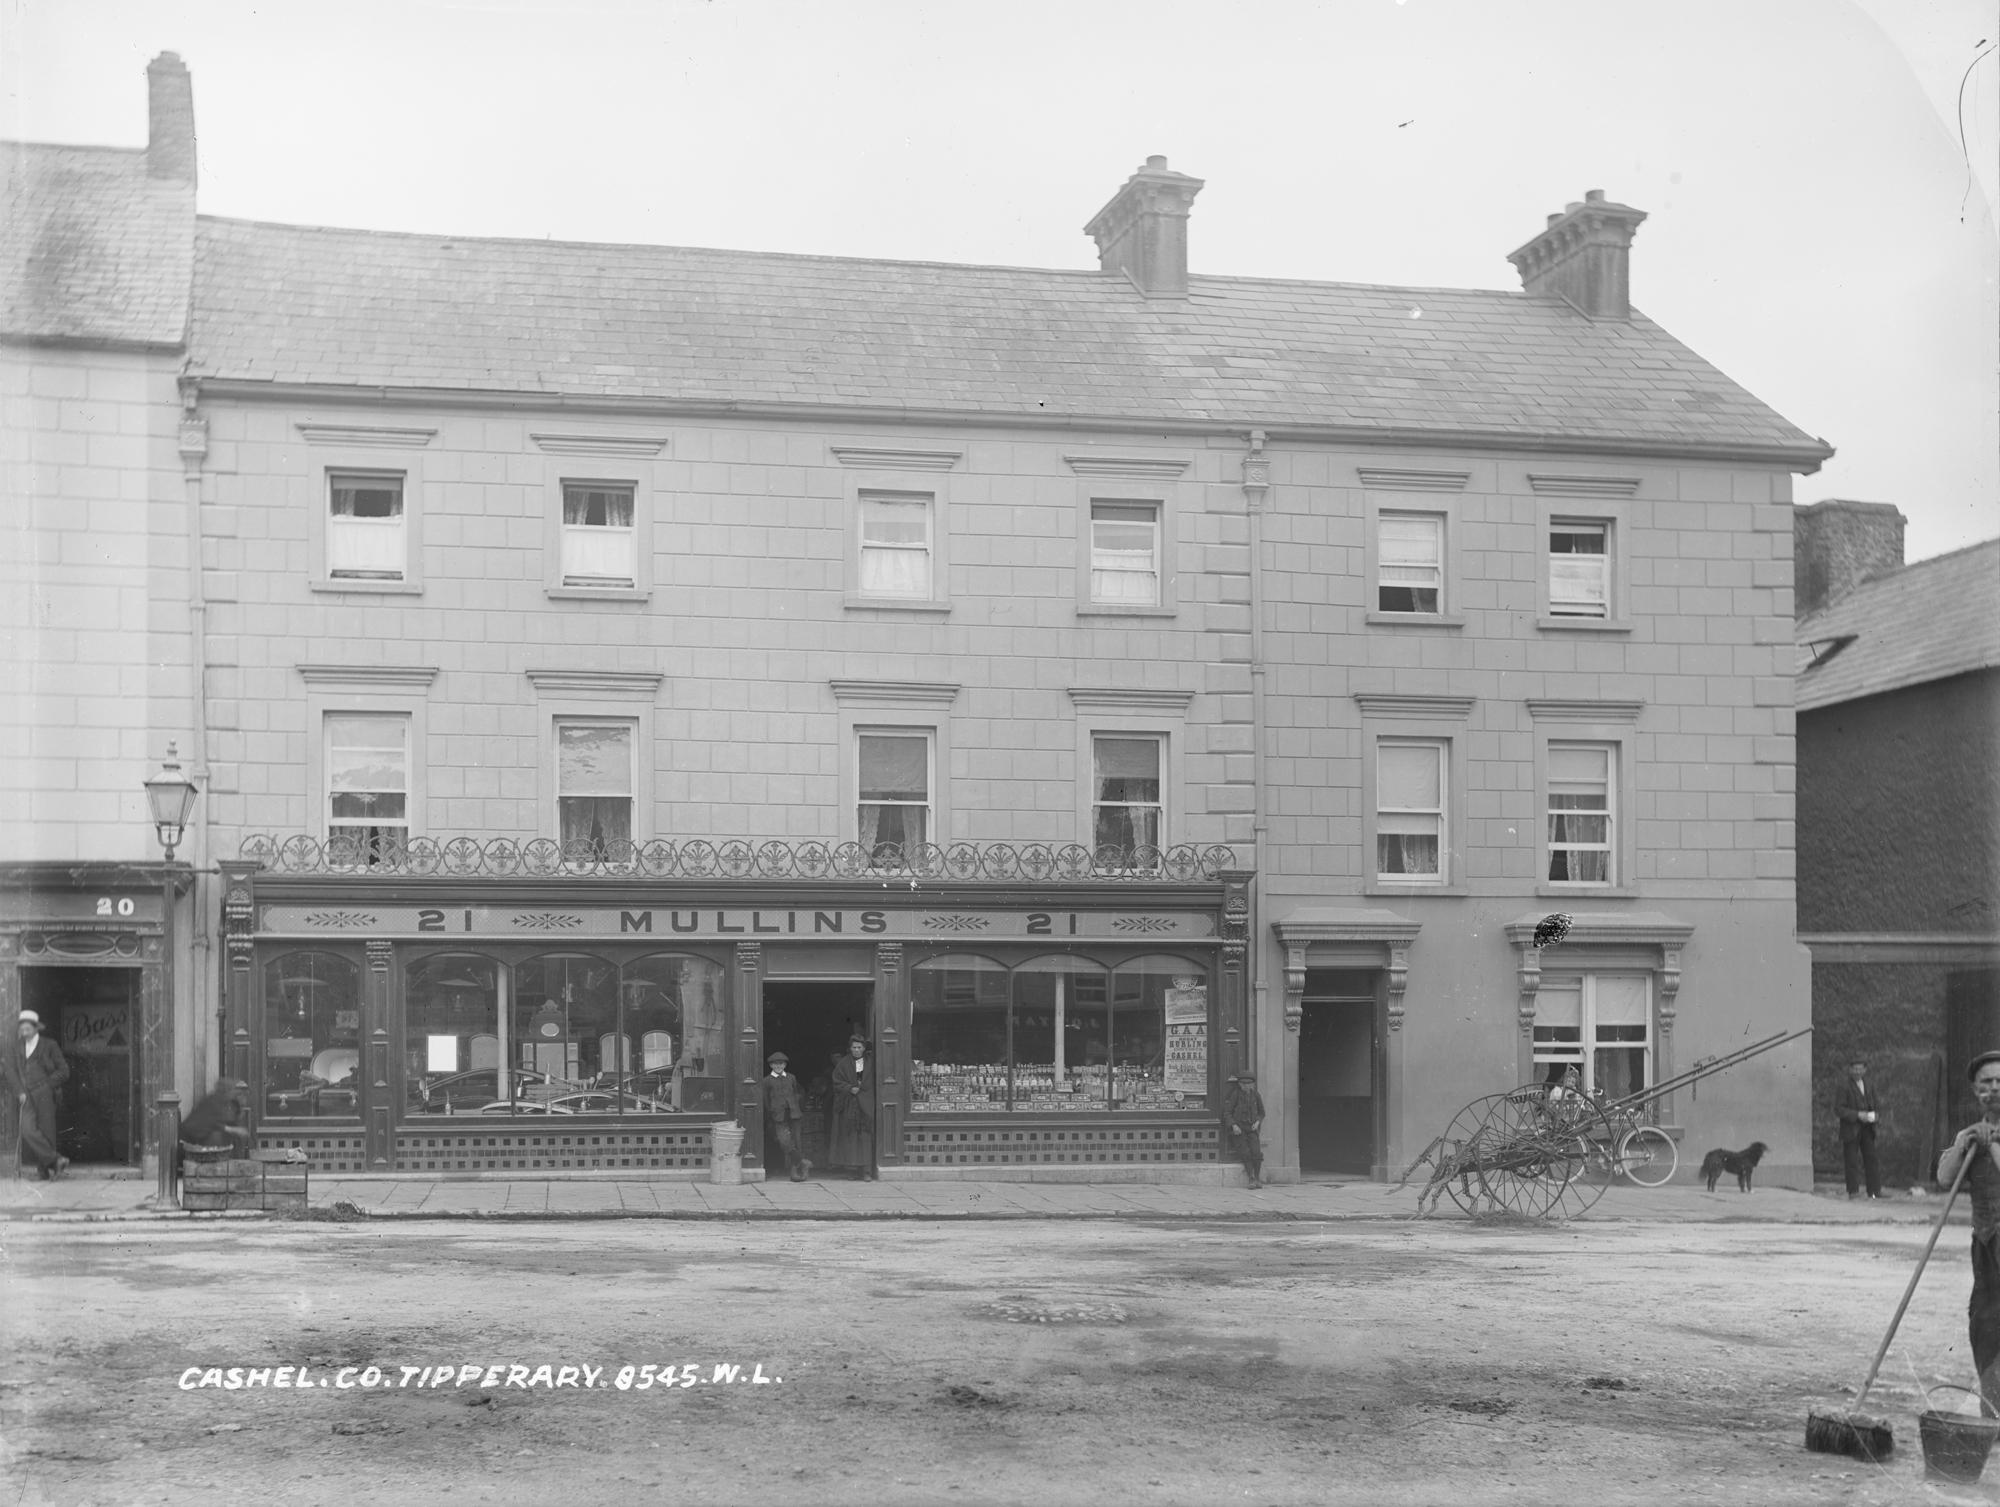 Mullins, Cashel Co.Tipperary